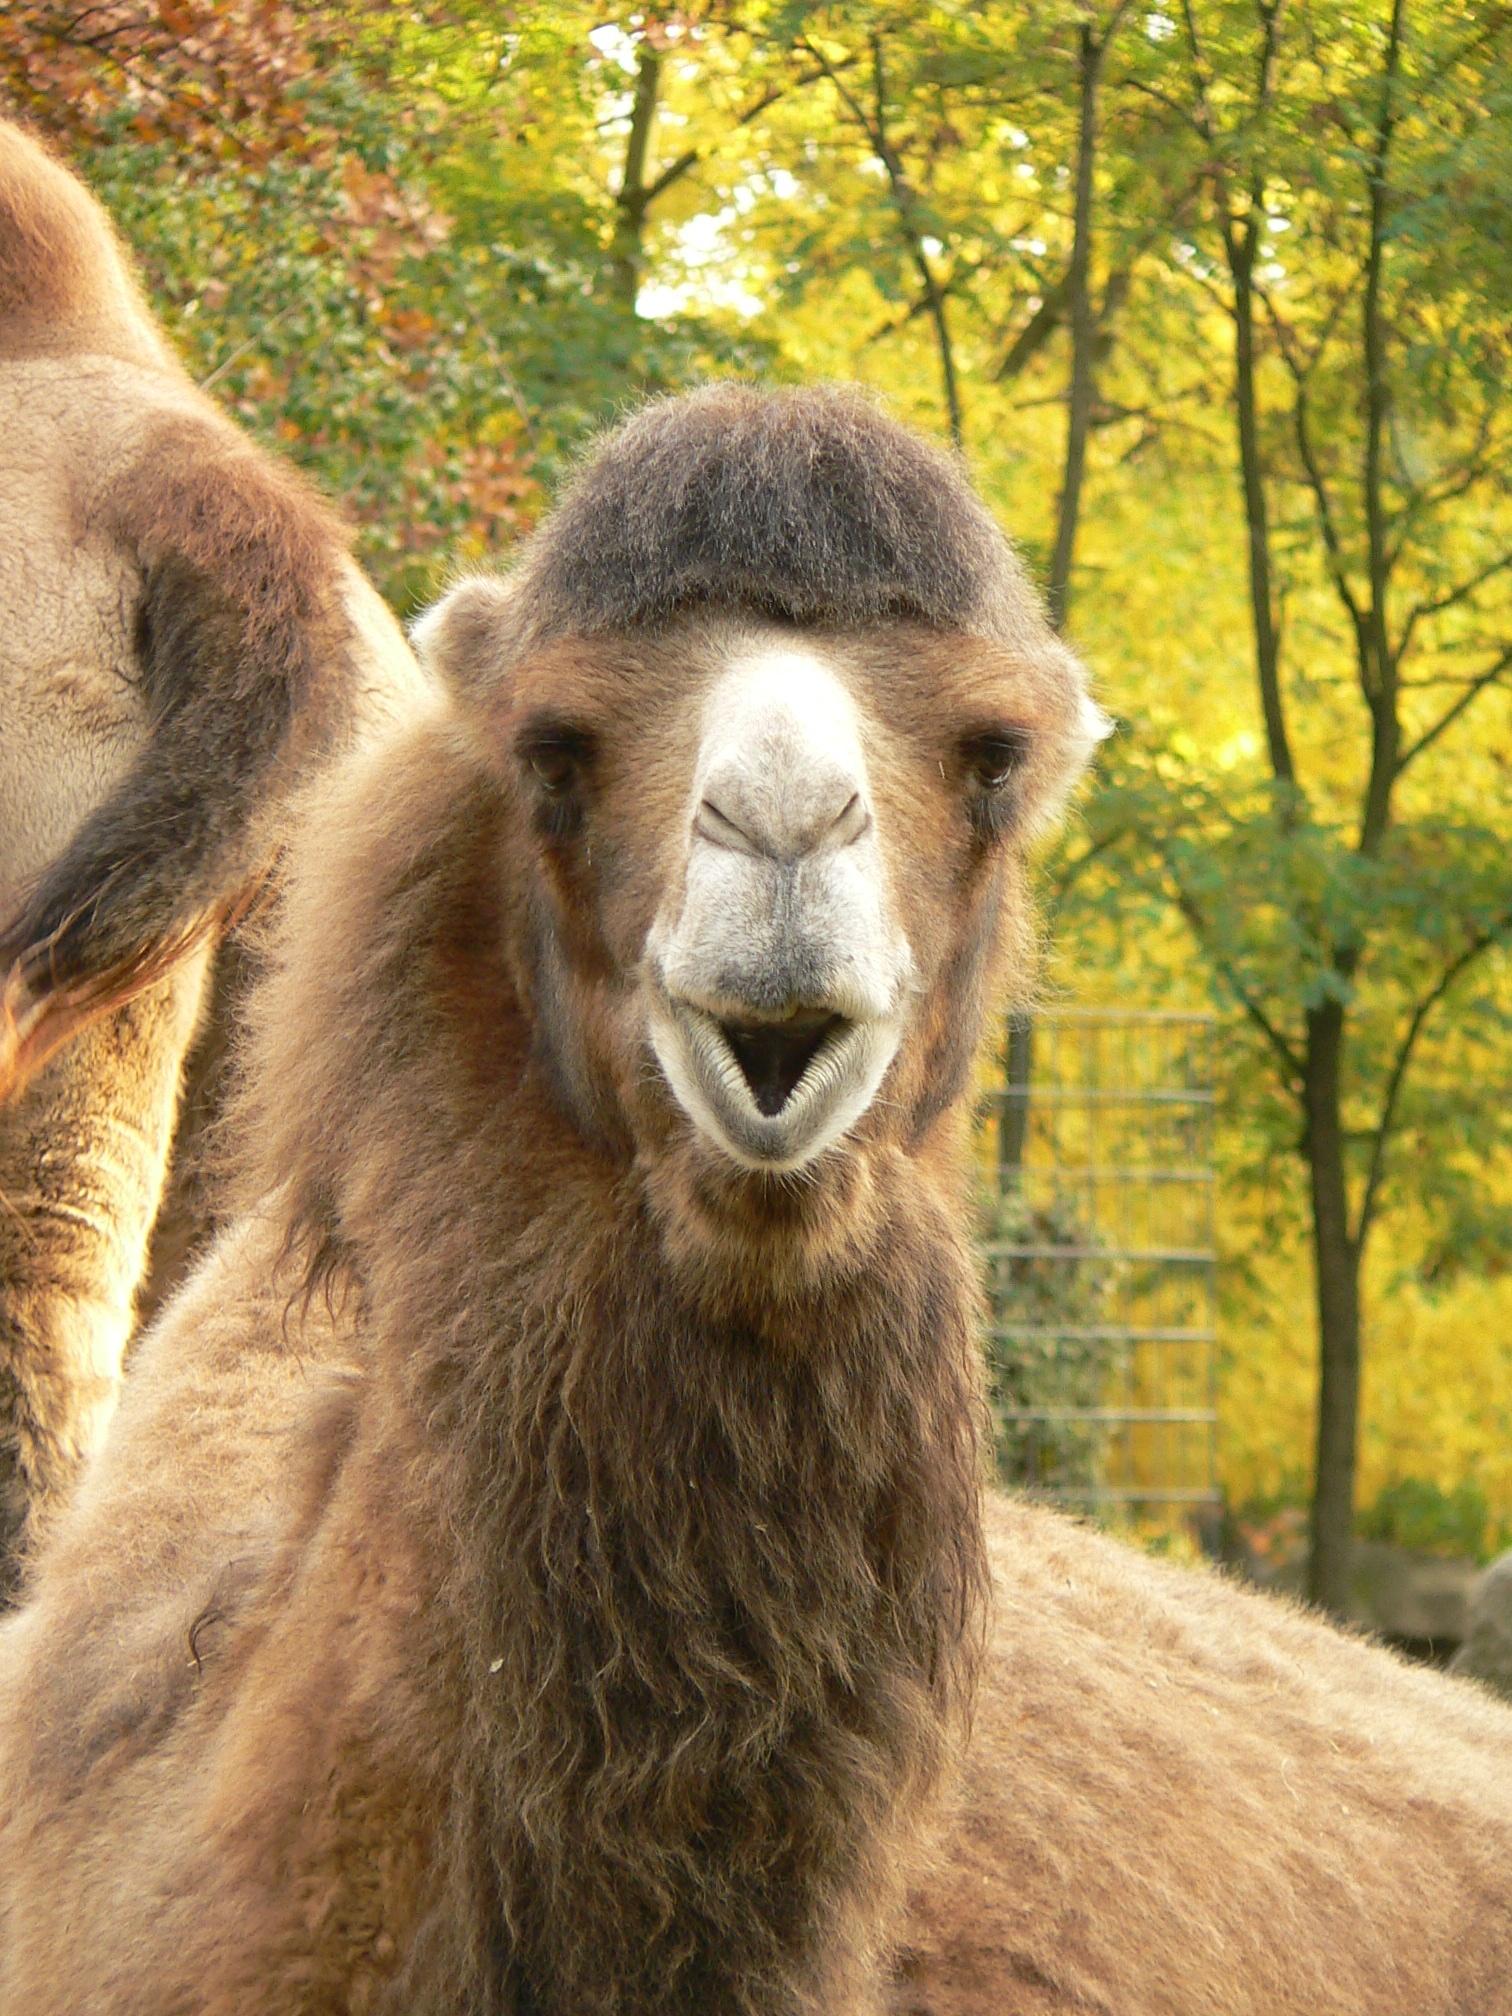 File:Zoo Berlin Dromedar.jpg - Wikimedia Commons